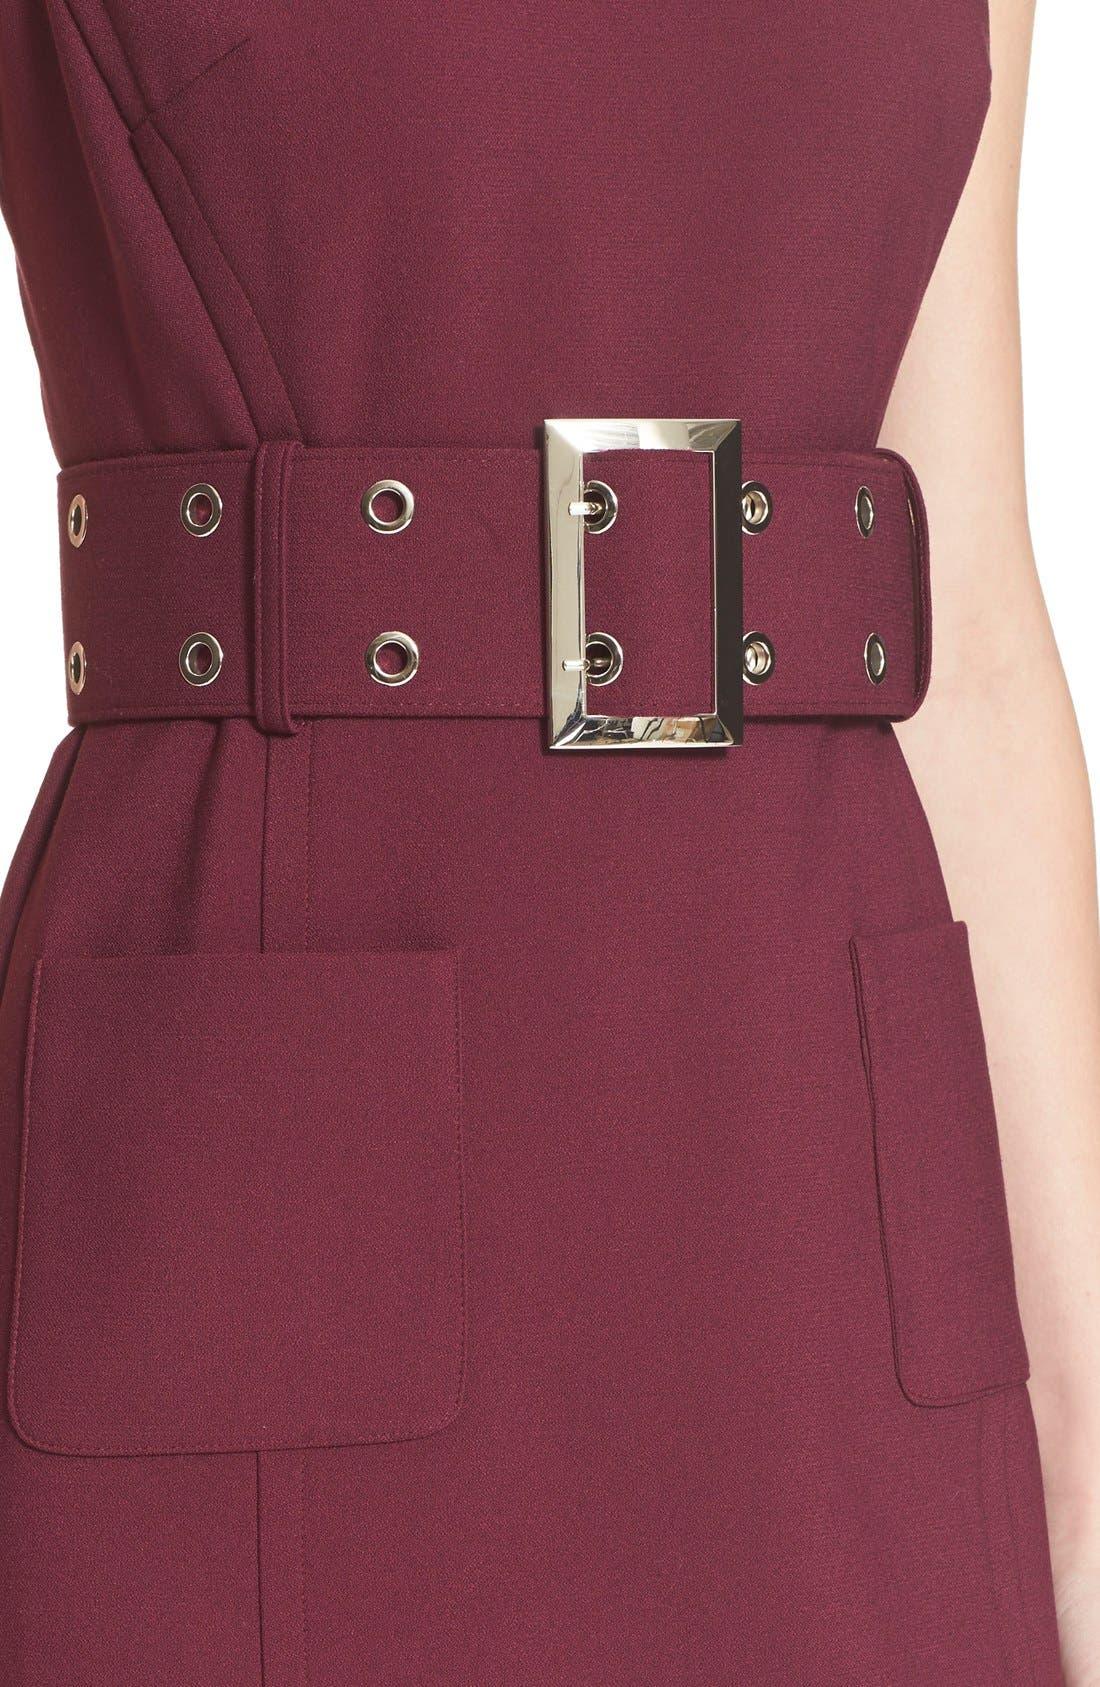 Double Crepe Belted Minidress,                             Alternate thumbnail 4, color,                             Burgundy